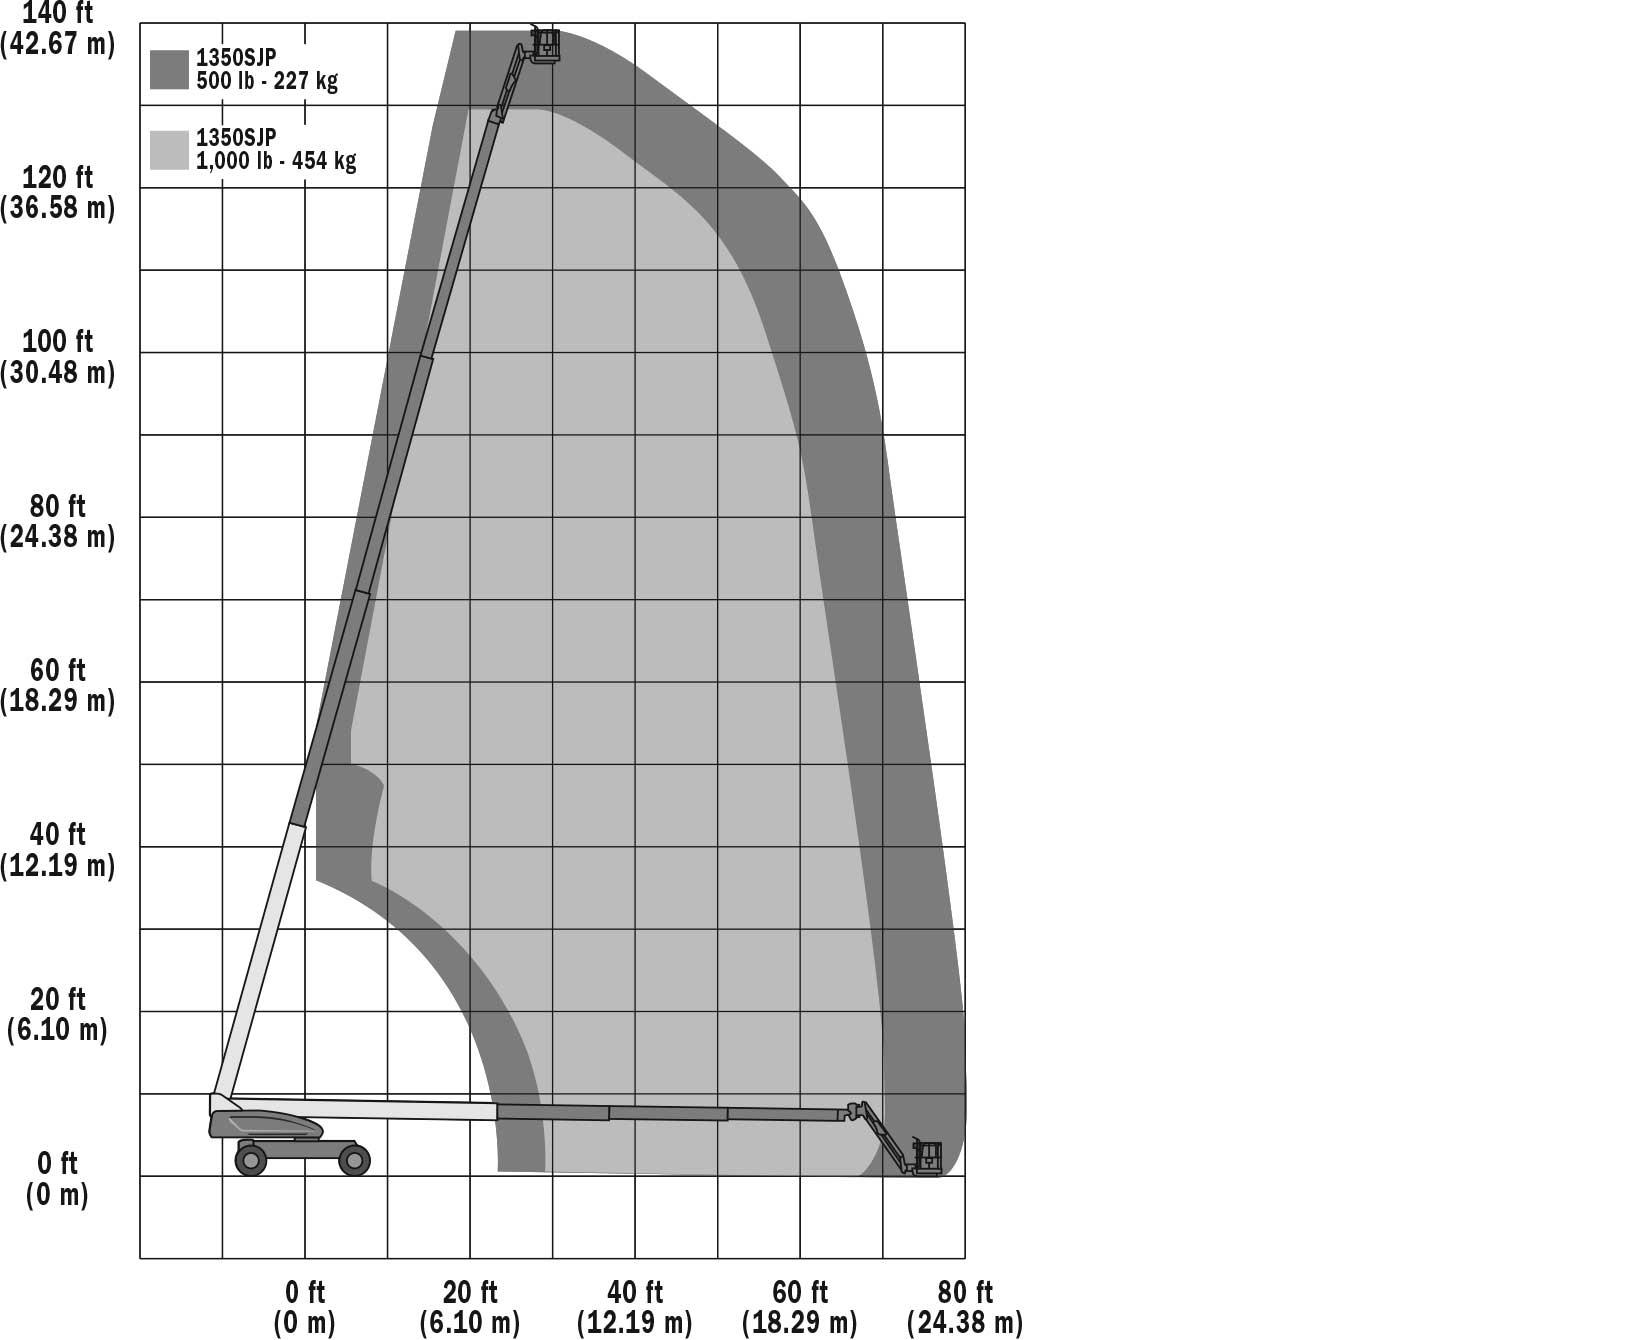 Enchanting Upright Scissor Lift Wiring Diagrams Photos - Wiring ...